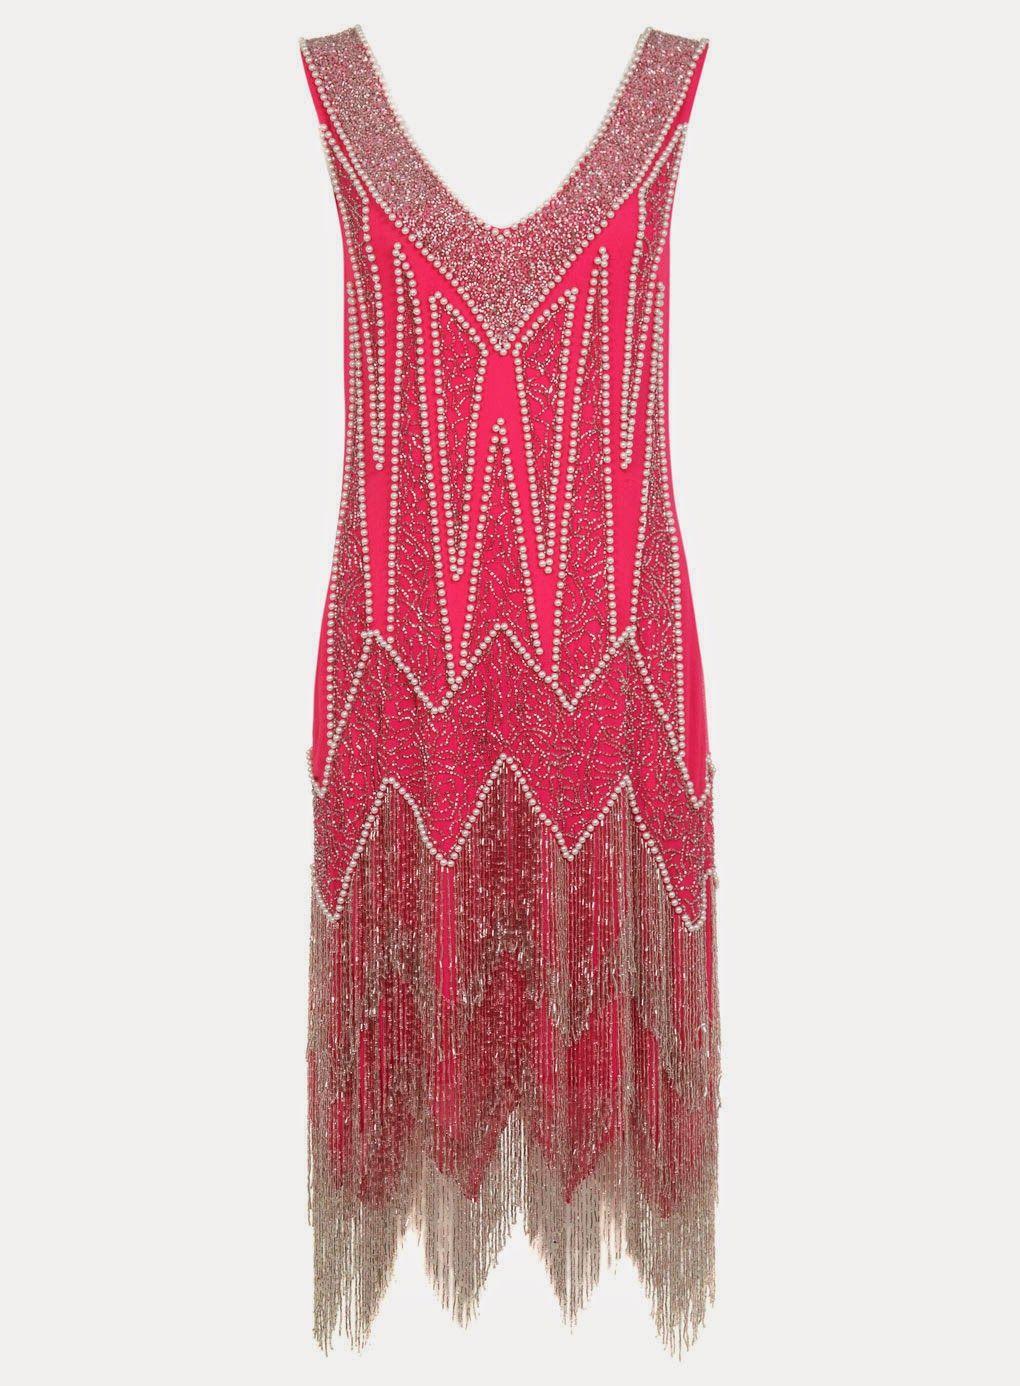 Increíble Prom Vestidos Selfridges Inspiración - Colección de ...